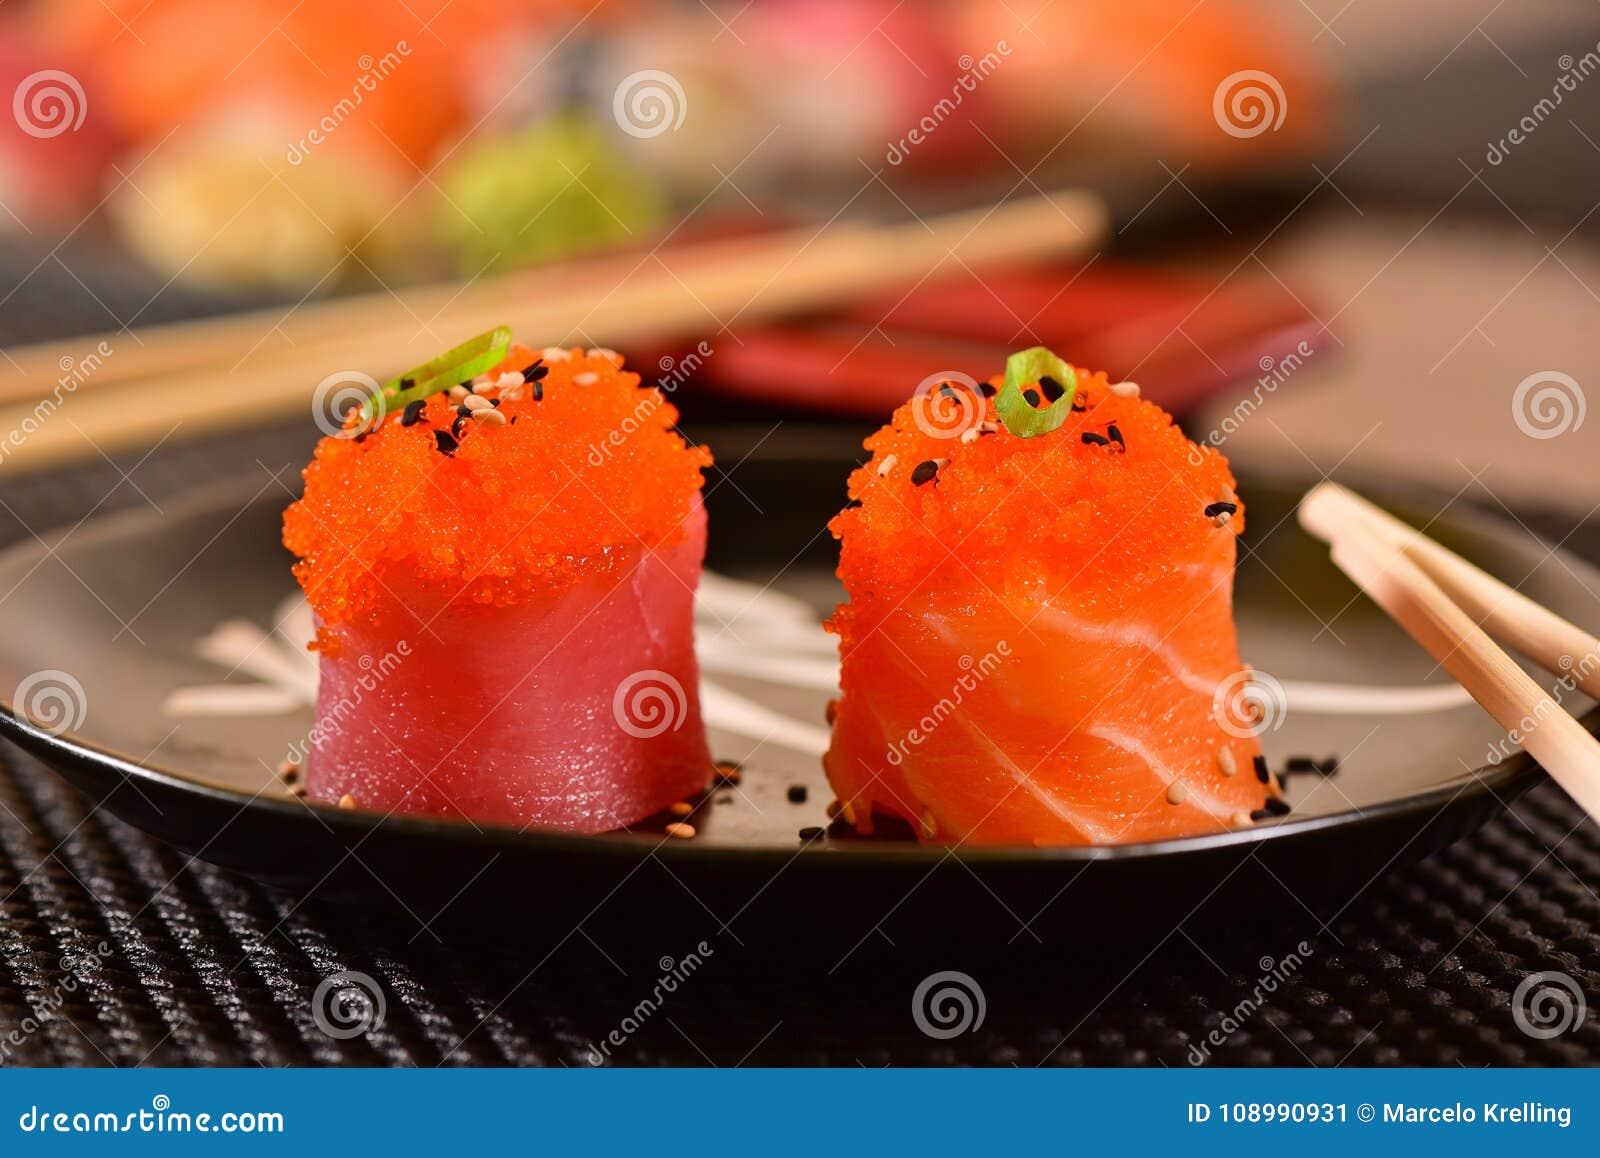 Salmon and fish eggs sushi stock image  Image of couple